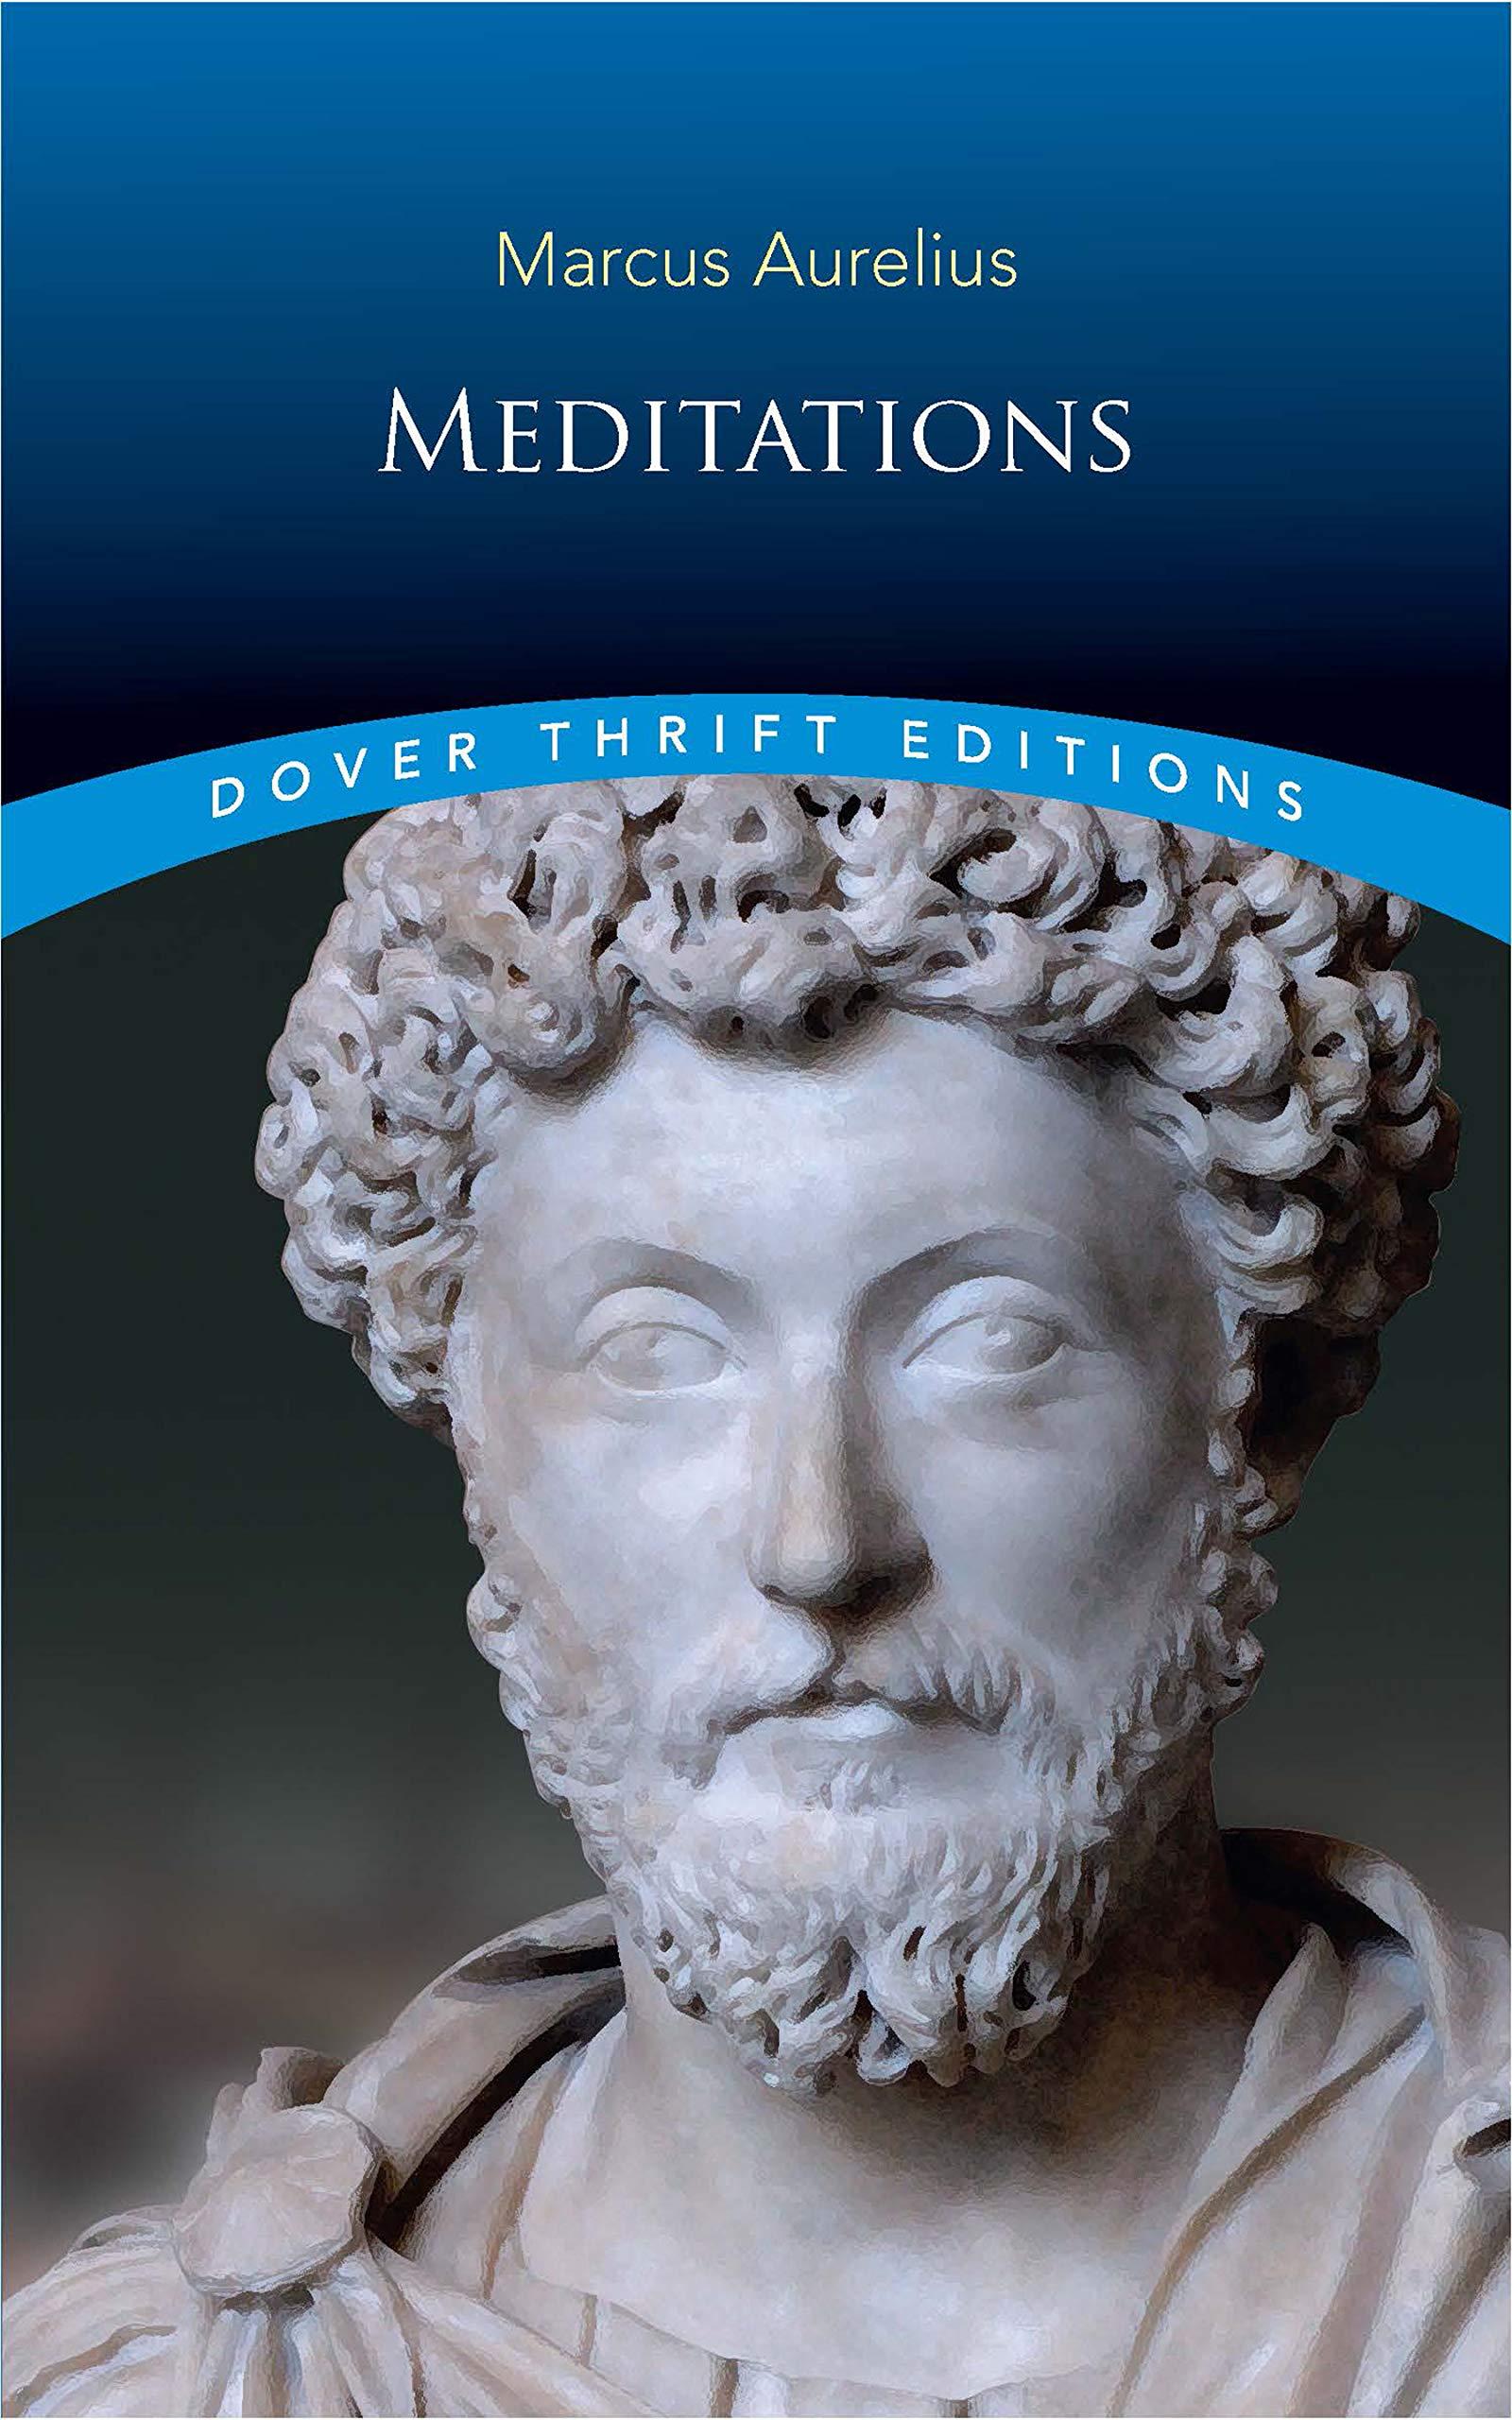 Meditations Dover Thrift Editions Kindle Edition By Aurelius Marcus Politics Social Sciences Kindle Ebooks Amazon Com